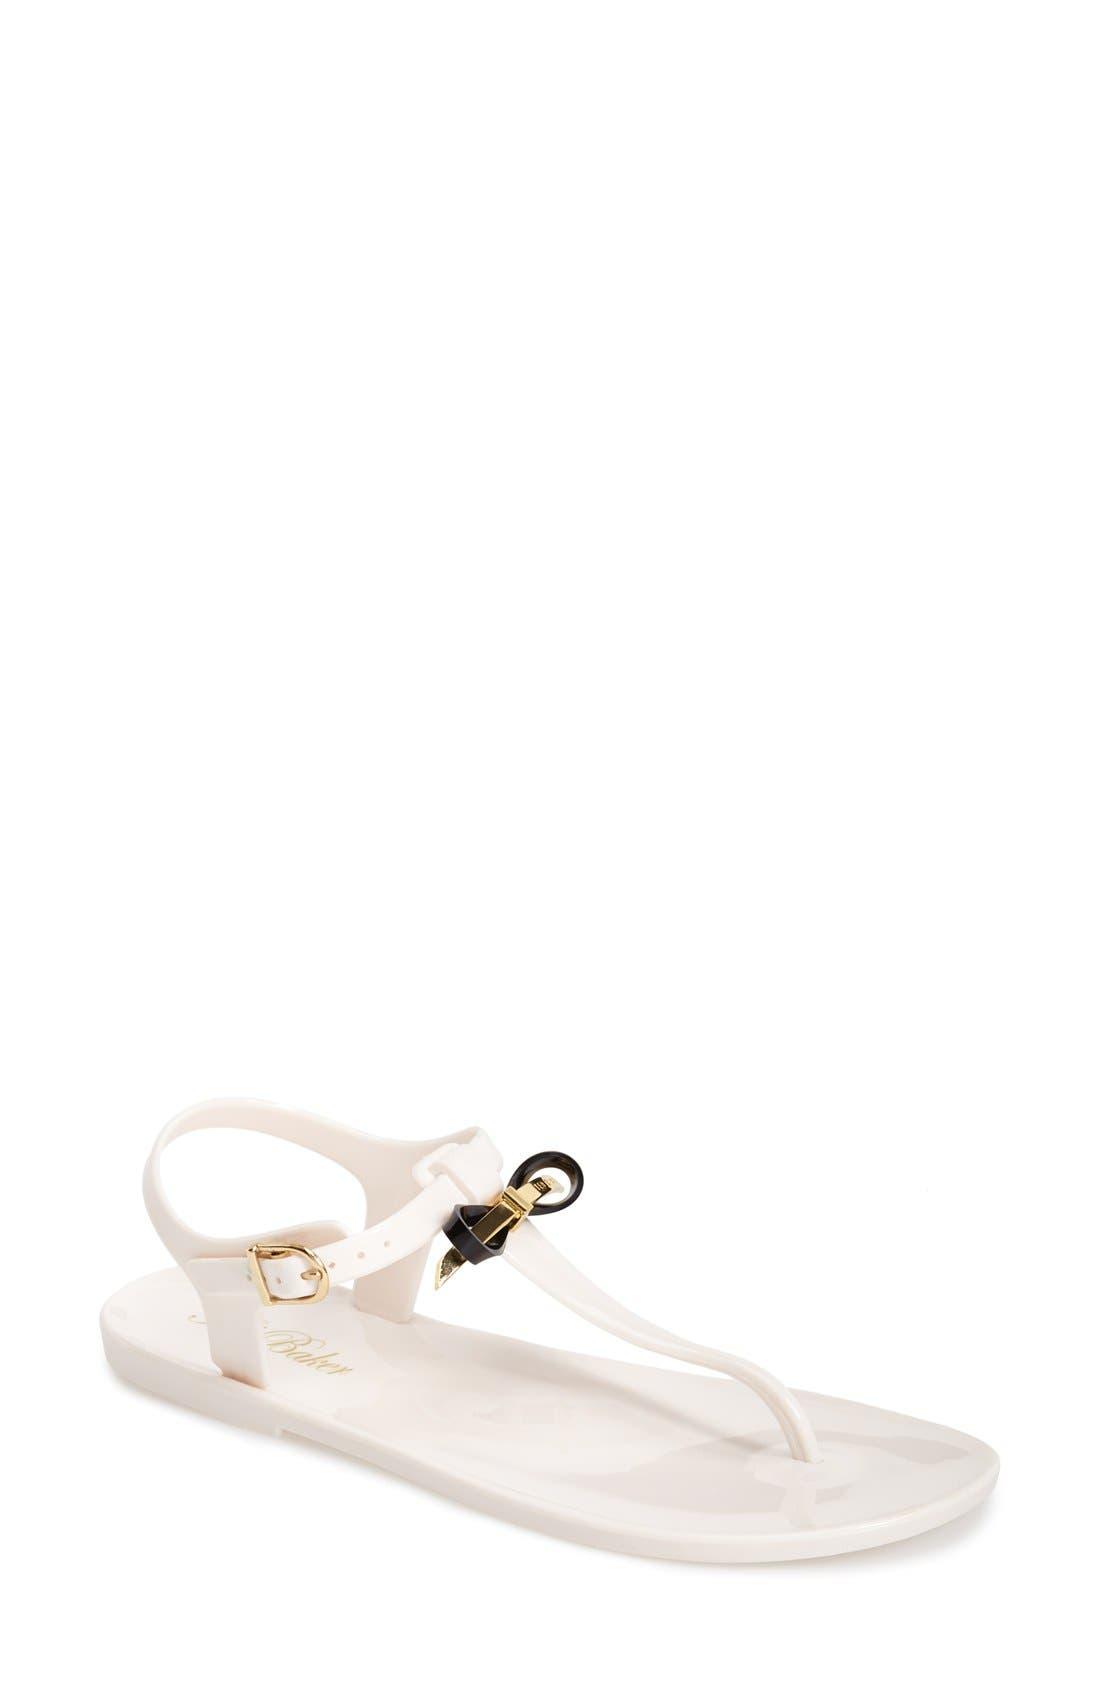 Main Image - Ted Baker London 'Verona' Jelly Sandal (Women)